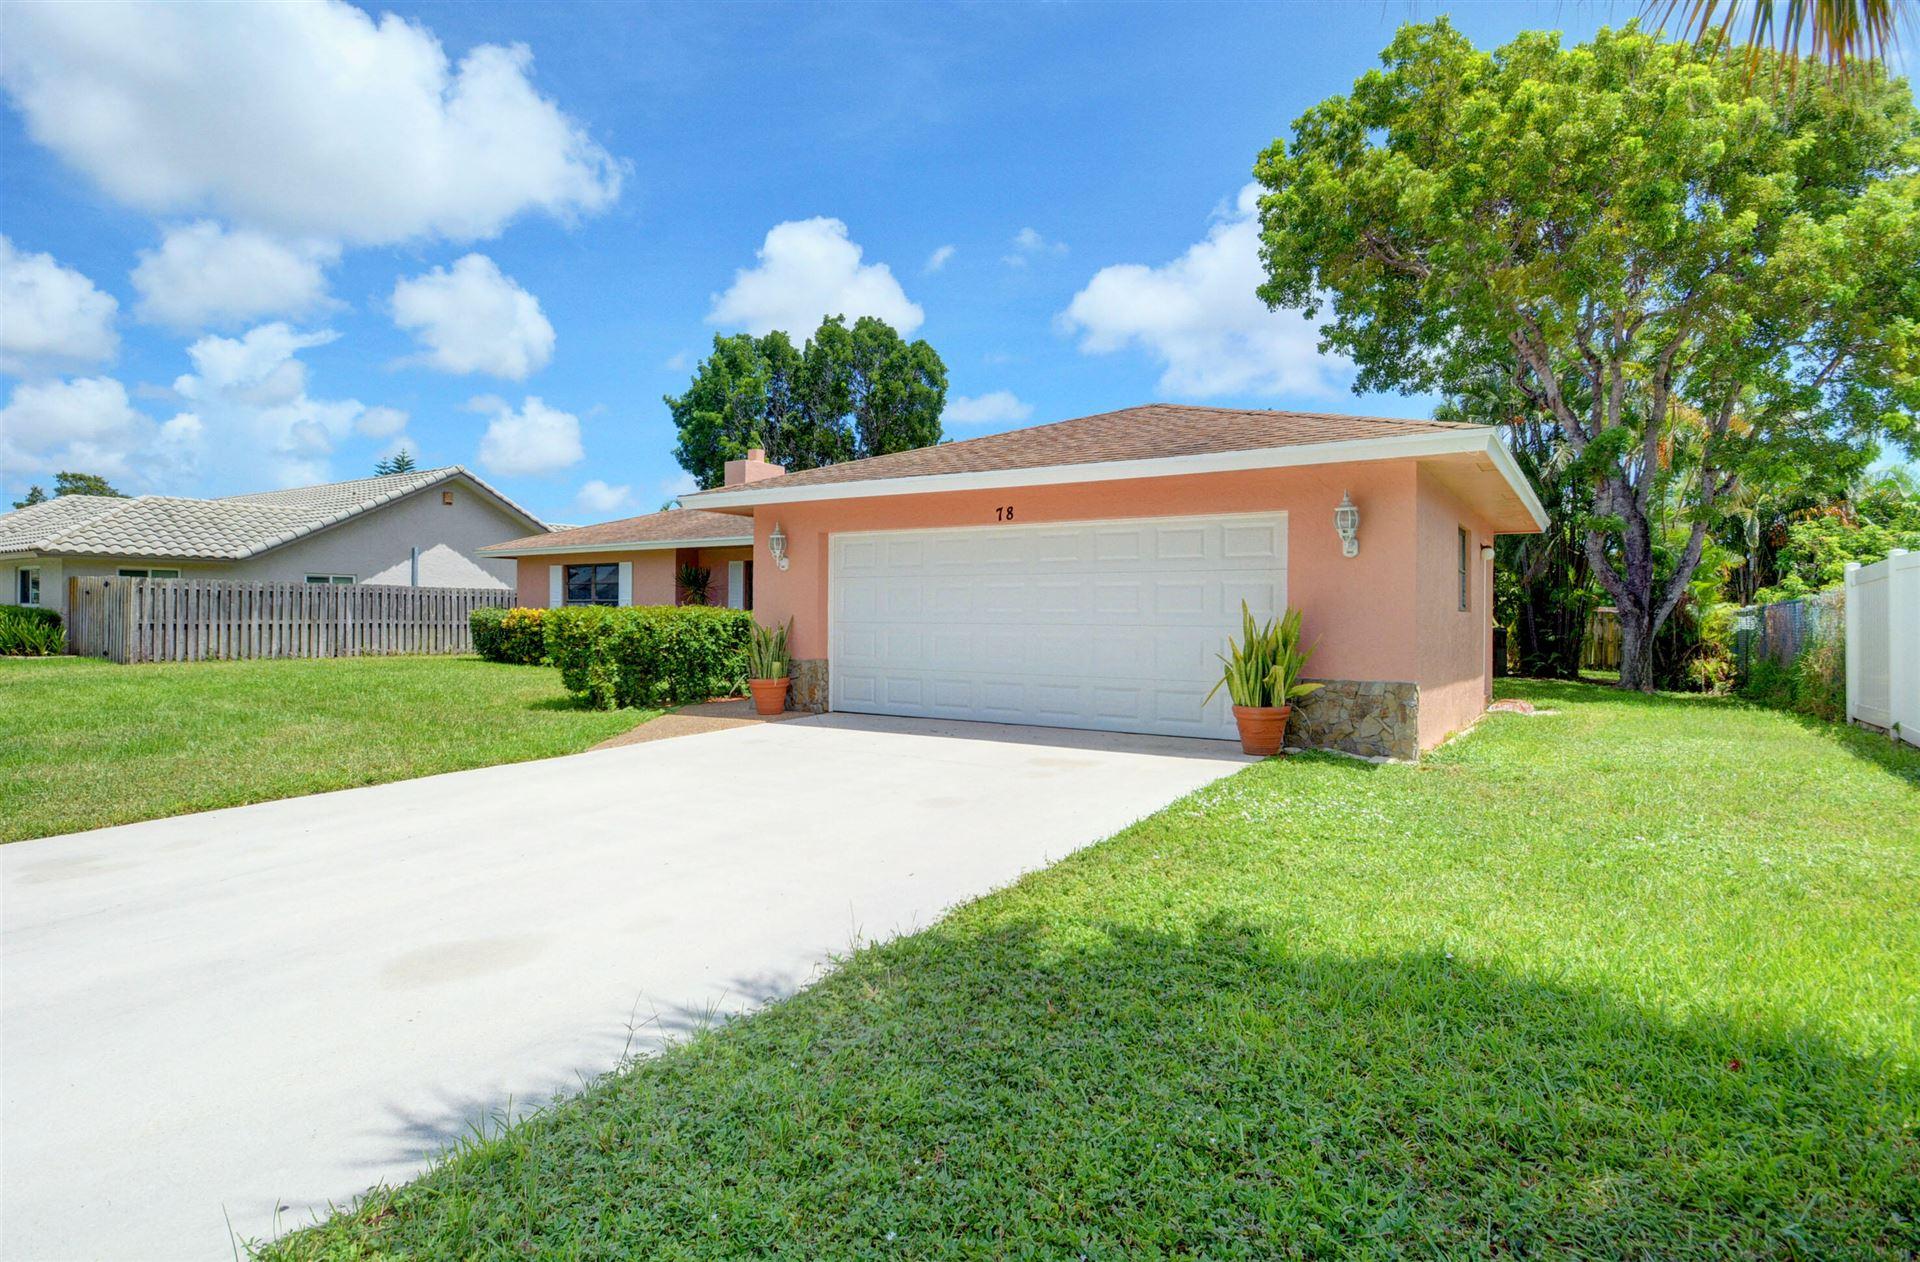 78 SW 12th Way, Boca Raton, FL 33486 - #: RX-10742743